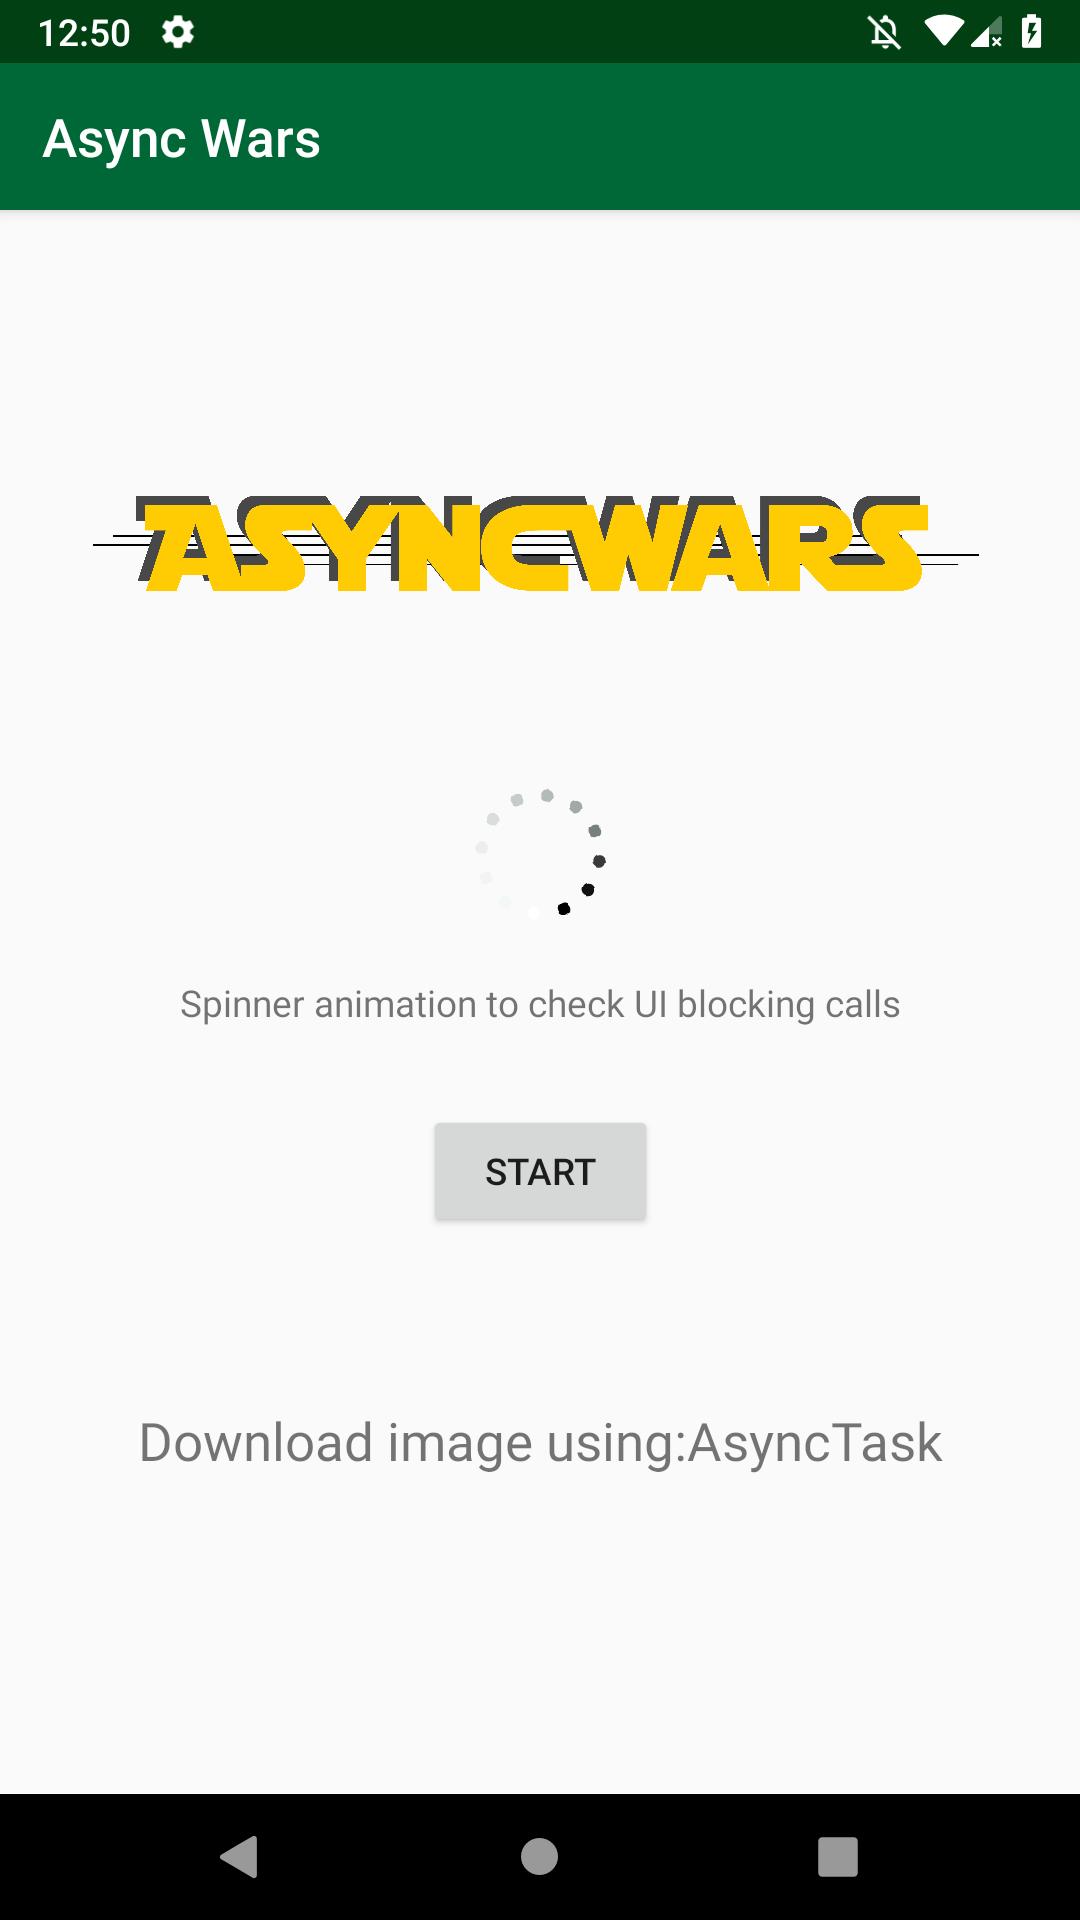 Download image using AsyncTask